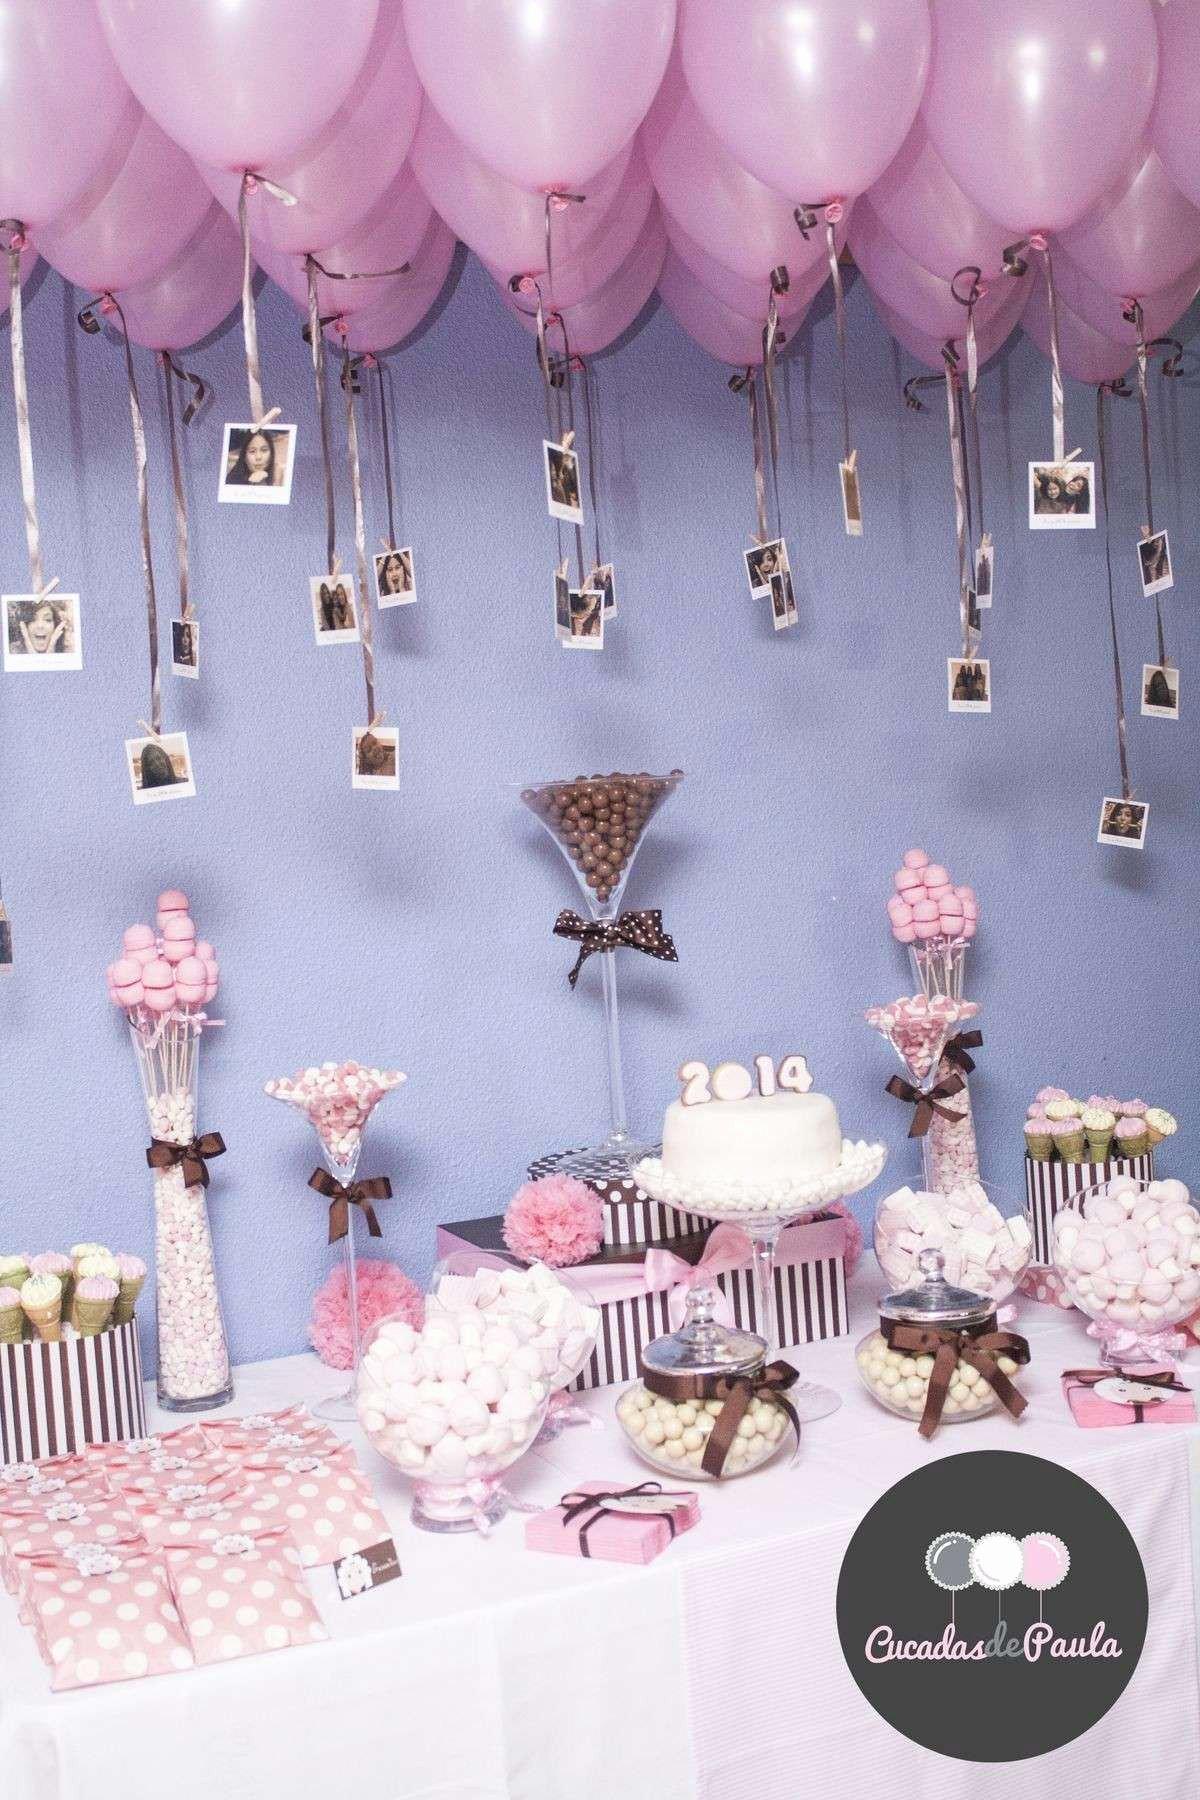 Baby Birthday Decoration Ideas at Home Elegant Awesome First Birthday Decoration Ideas at Home for Girl